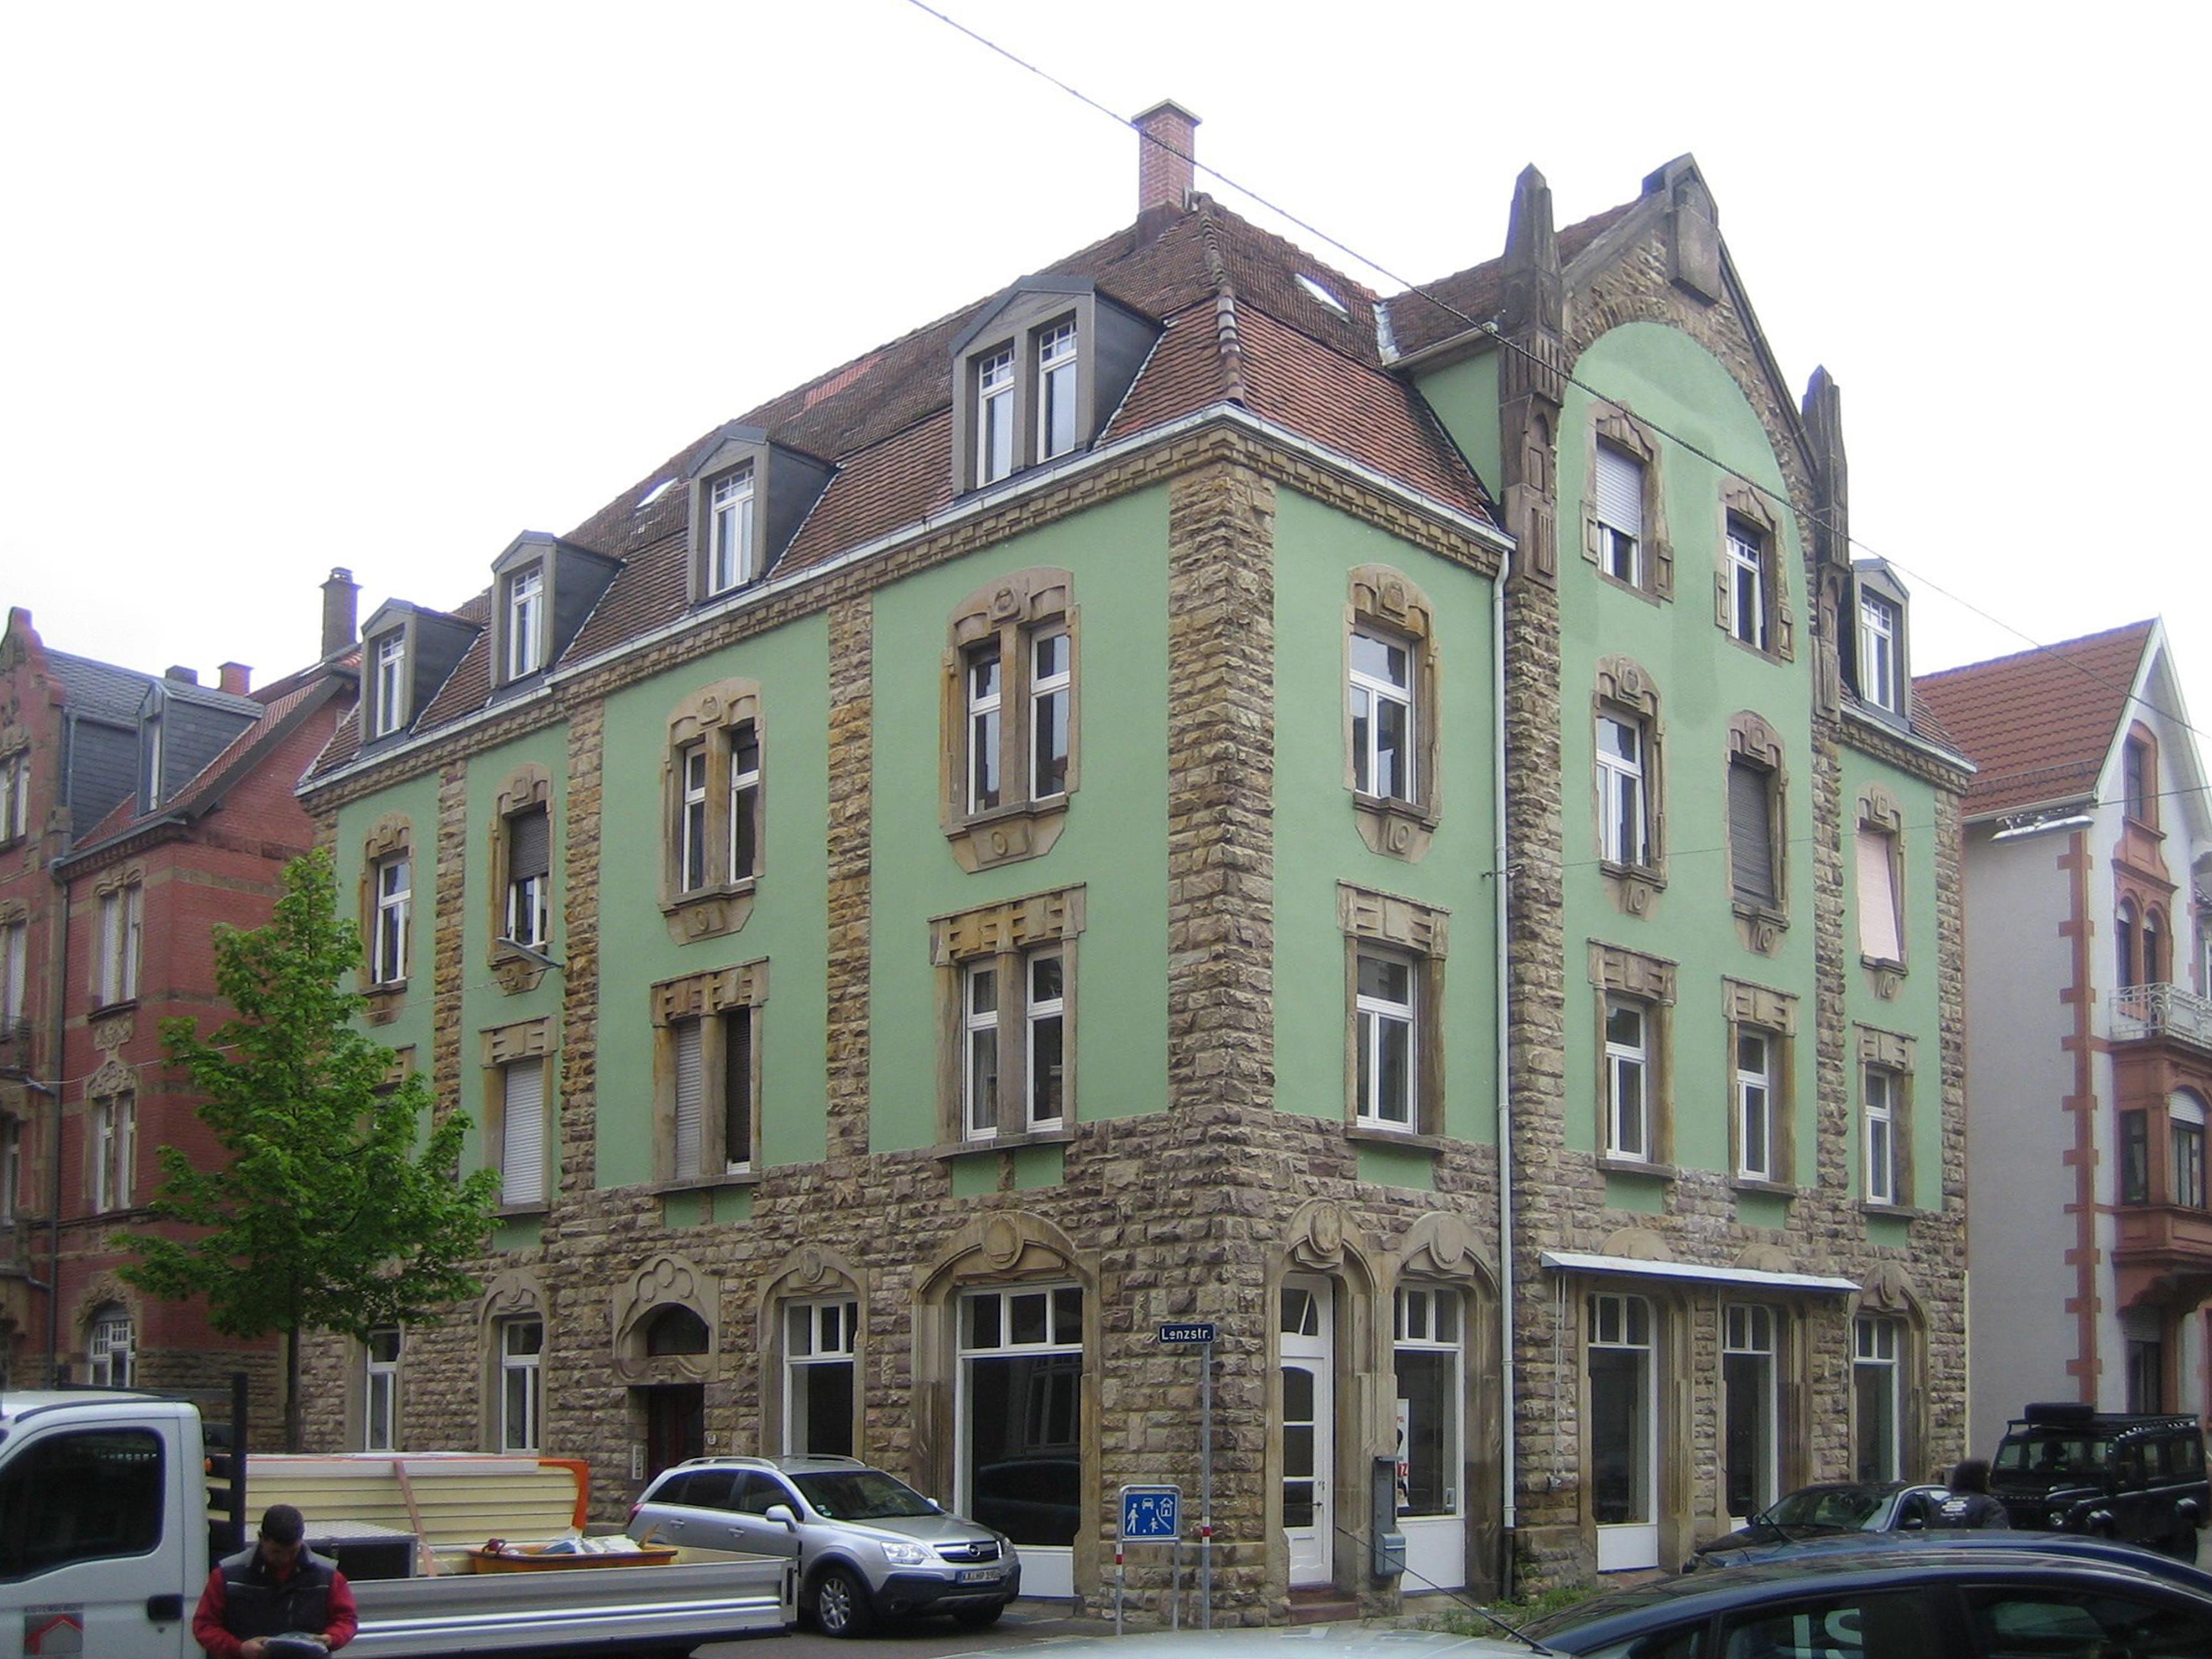 Generalsanierung stadthaus karlsruhe s dweststadt b ro - Architektur karlsruhe ...